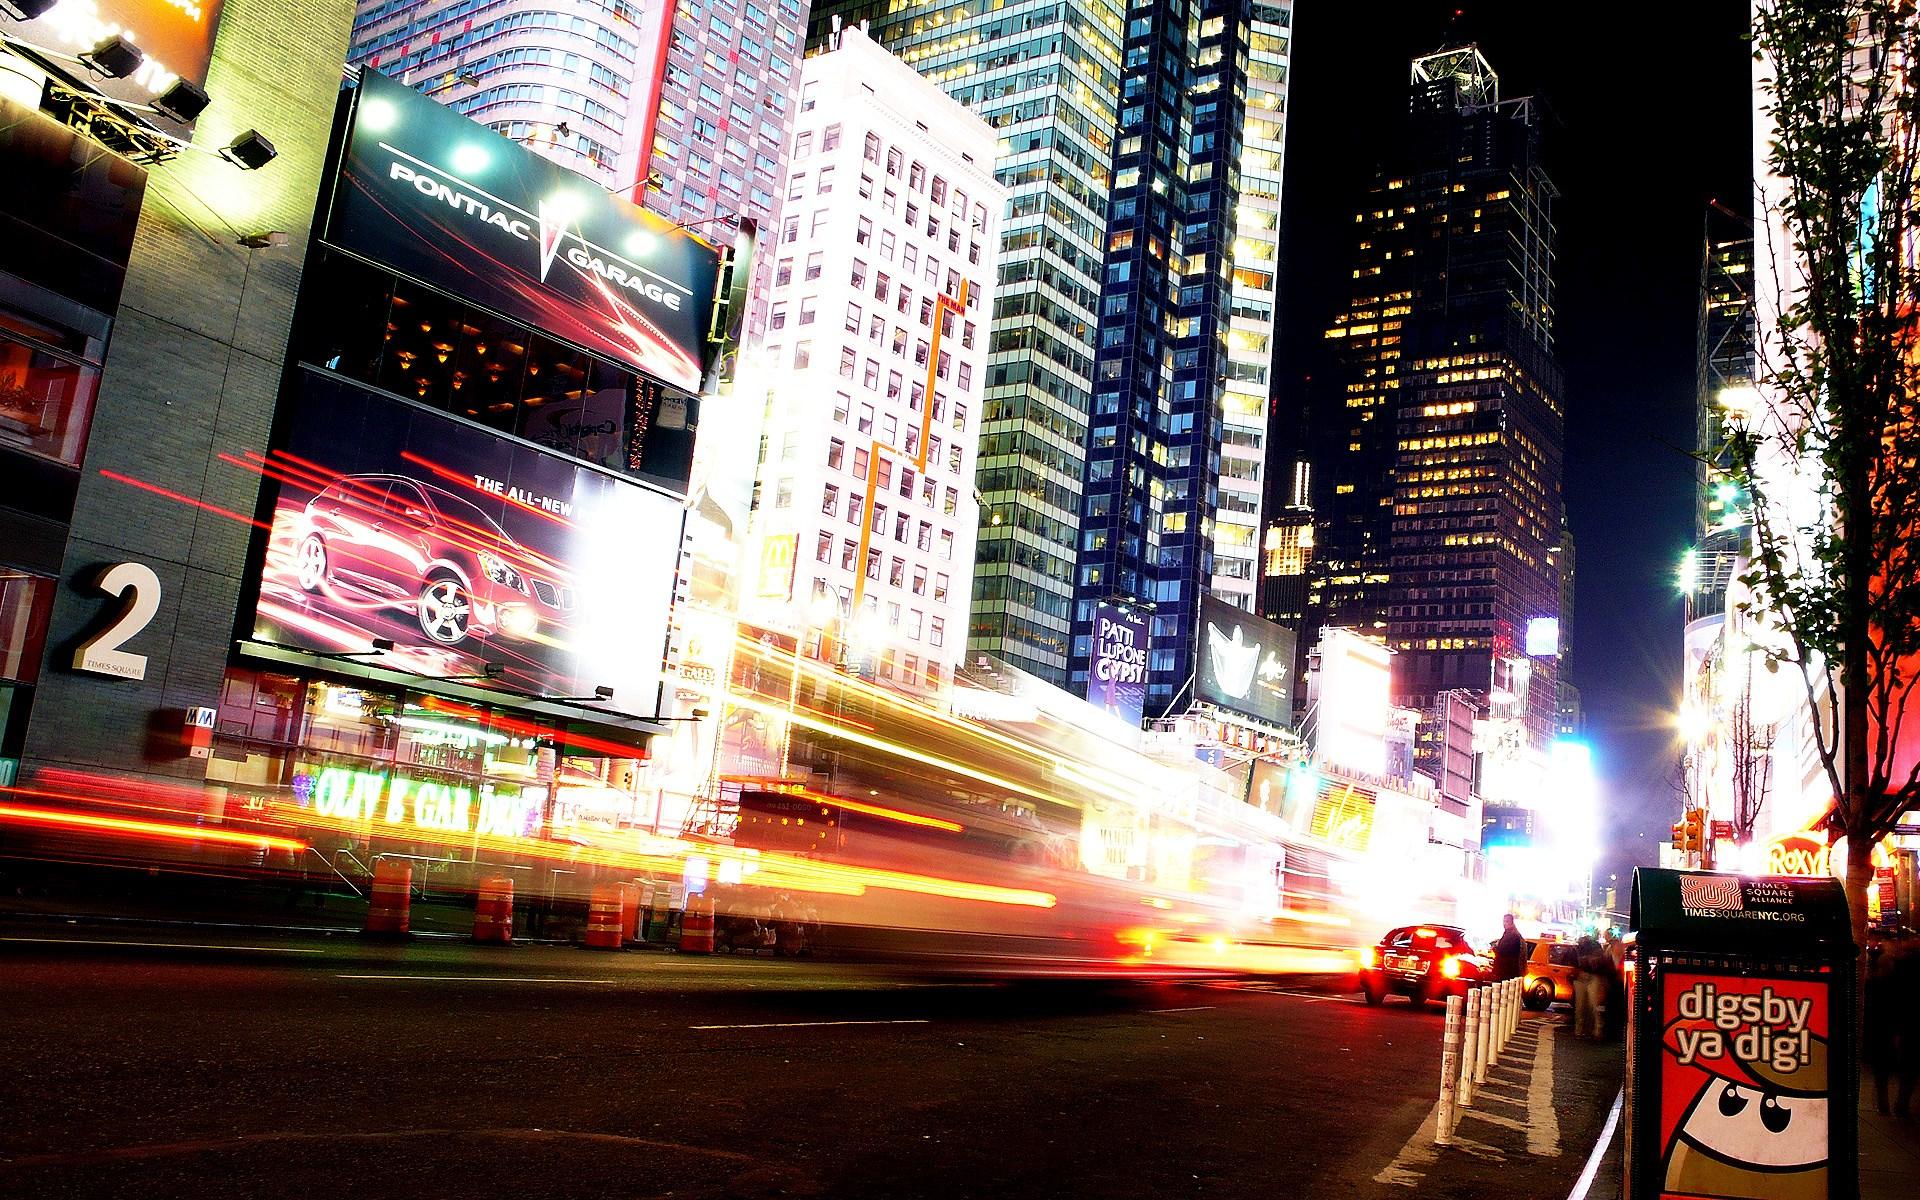 Galaxy S8 Animated Wallpaper Manhattan New York City Wallpaper 1920x1200